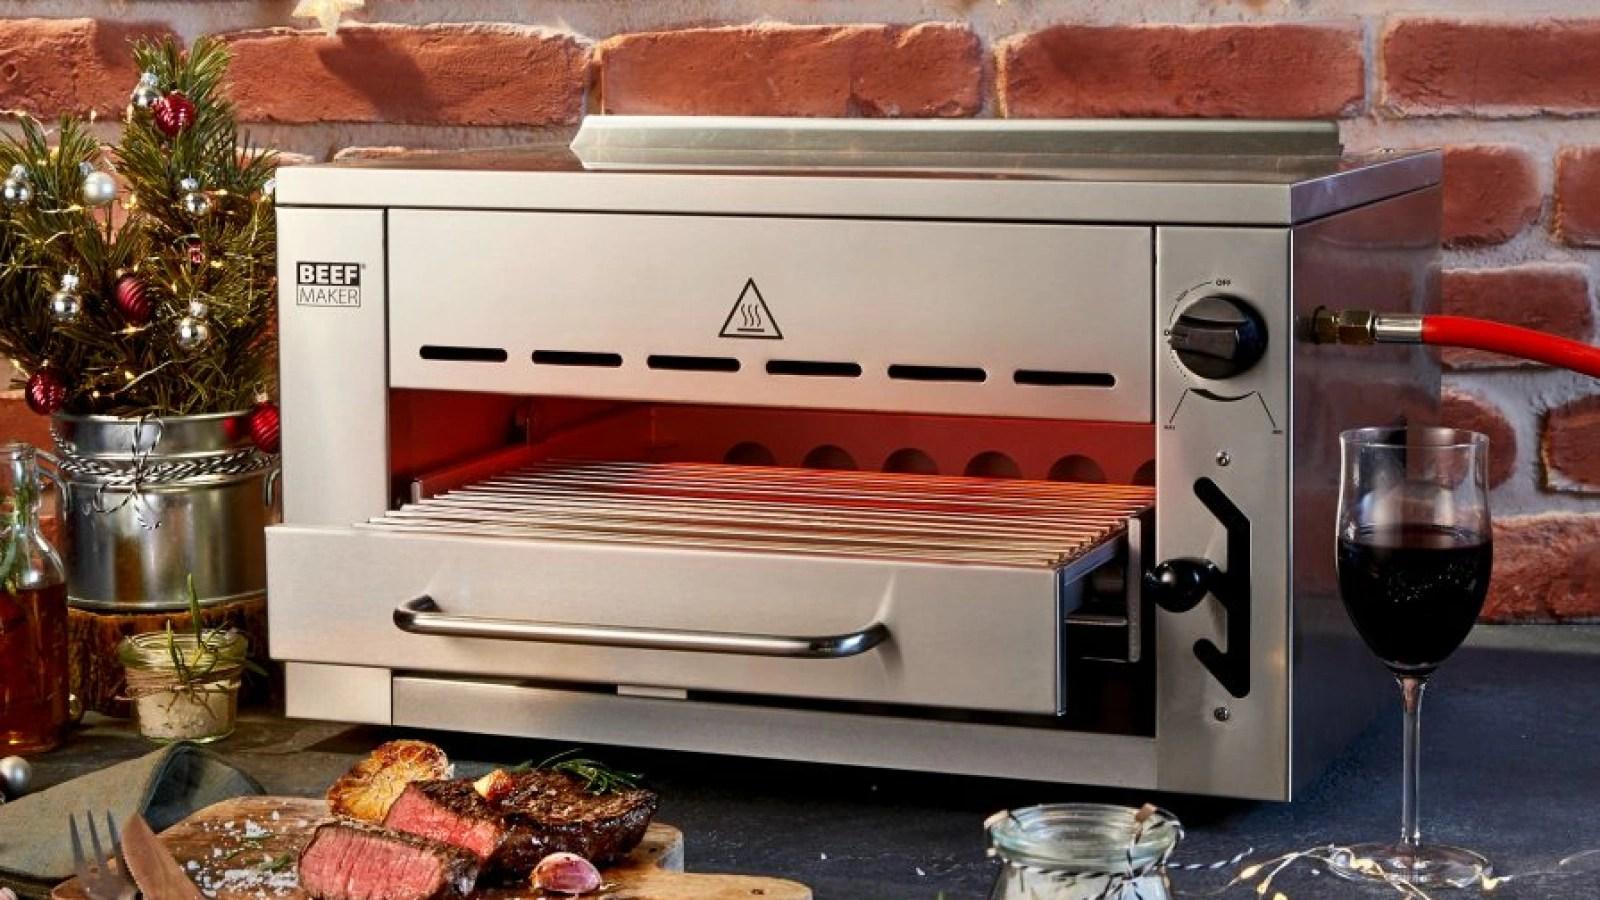 Aldi Kühlschrank 2018 Test : Aldi quigg retro küchenmaschine test: aldi küchengeräte quigg retro